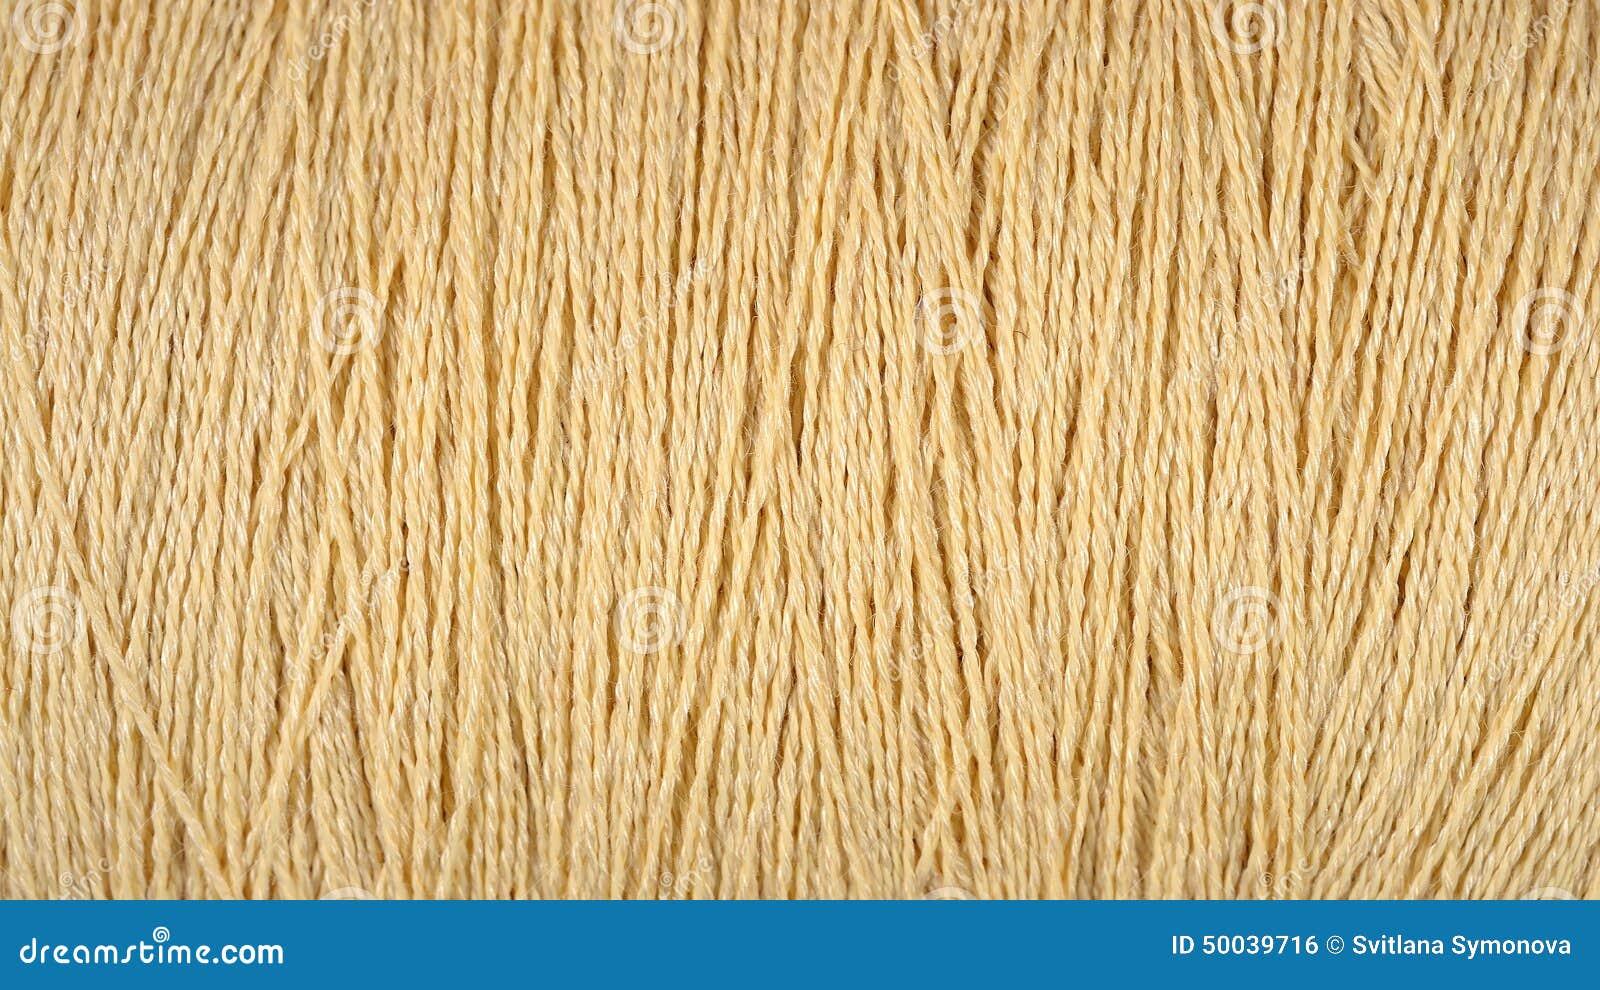 Beige Thread Stock Image